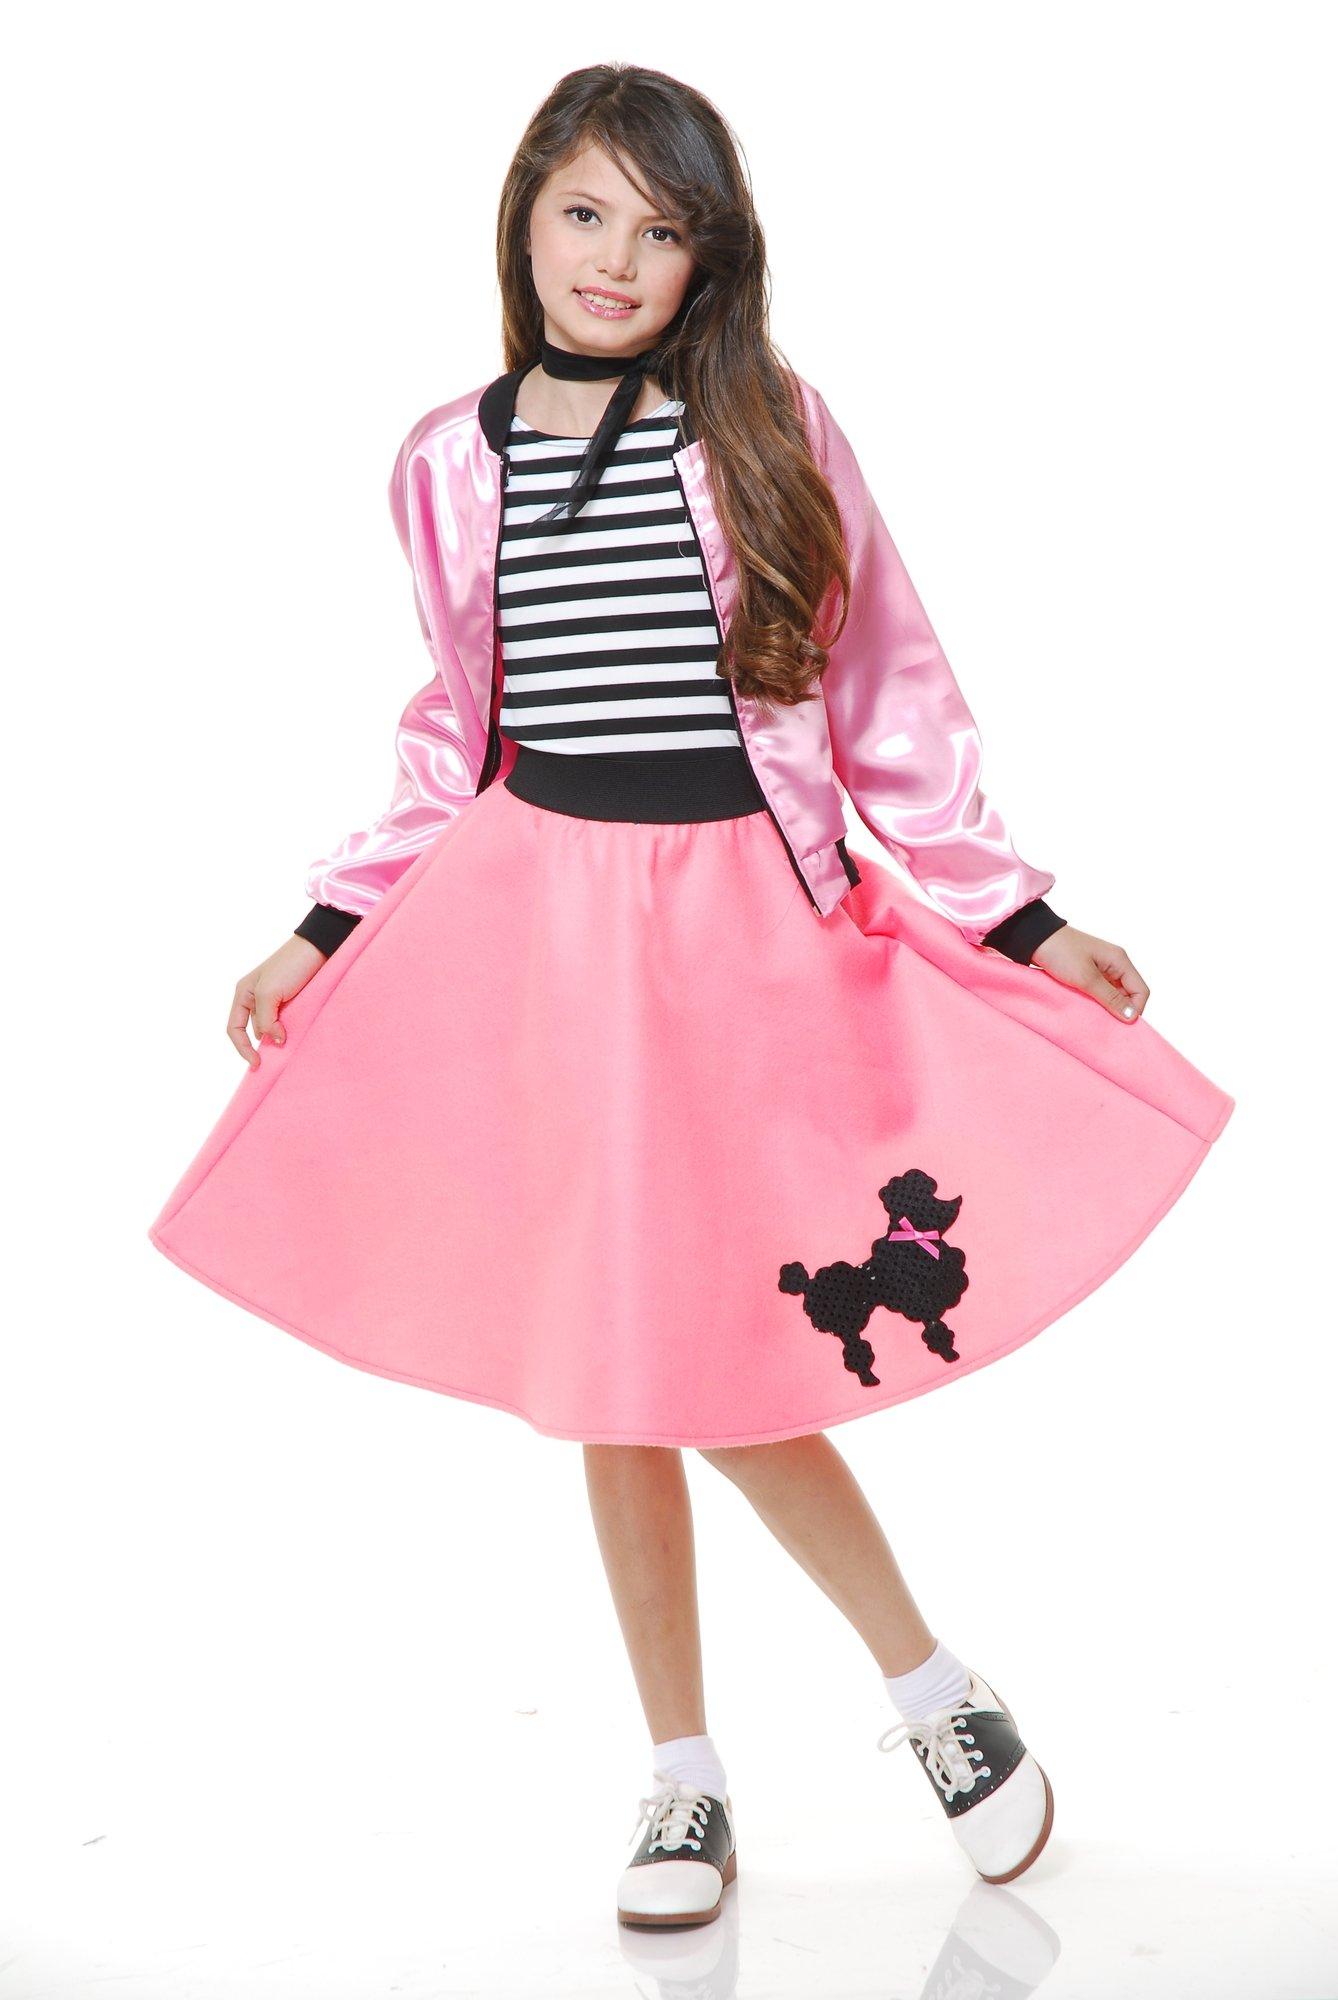 Charades Poodle Costume Dress, Pink, Medium